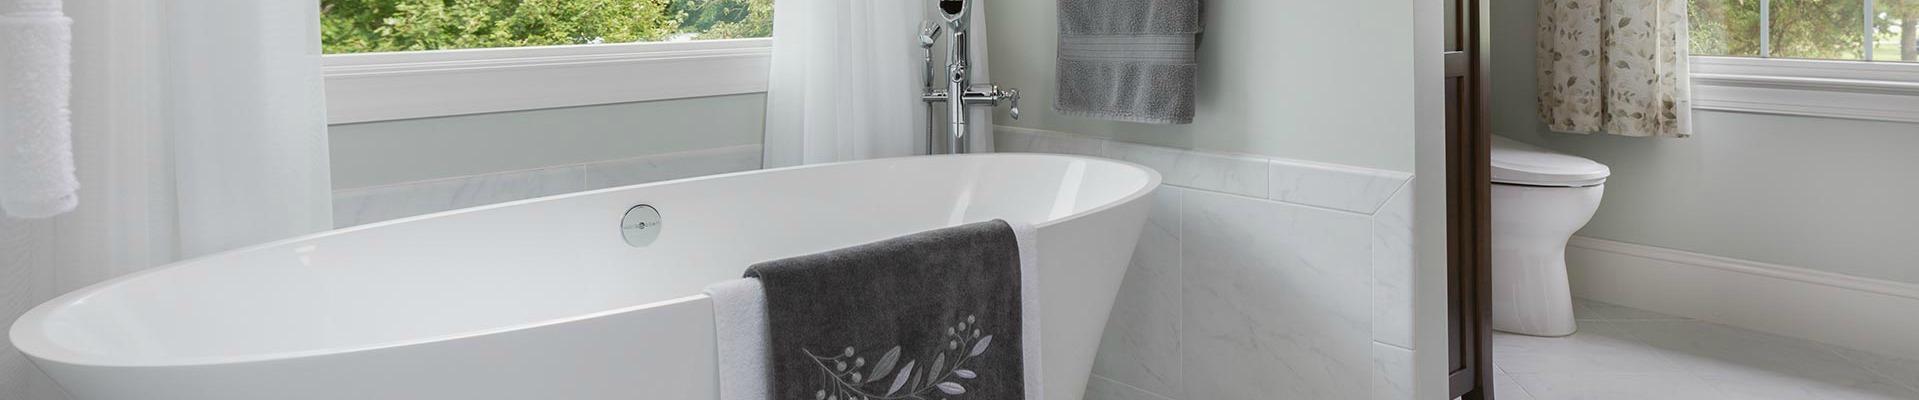 complete bathroom remodel. Beautiful Remodel Bathroom Remodeling In Bluffton SC On Complete Remodel